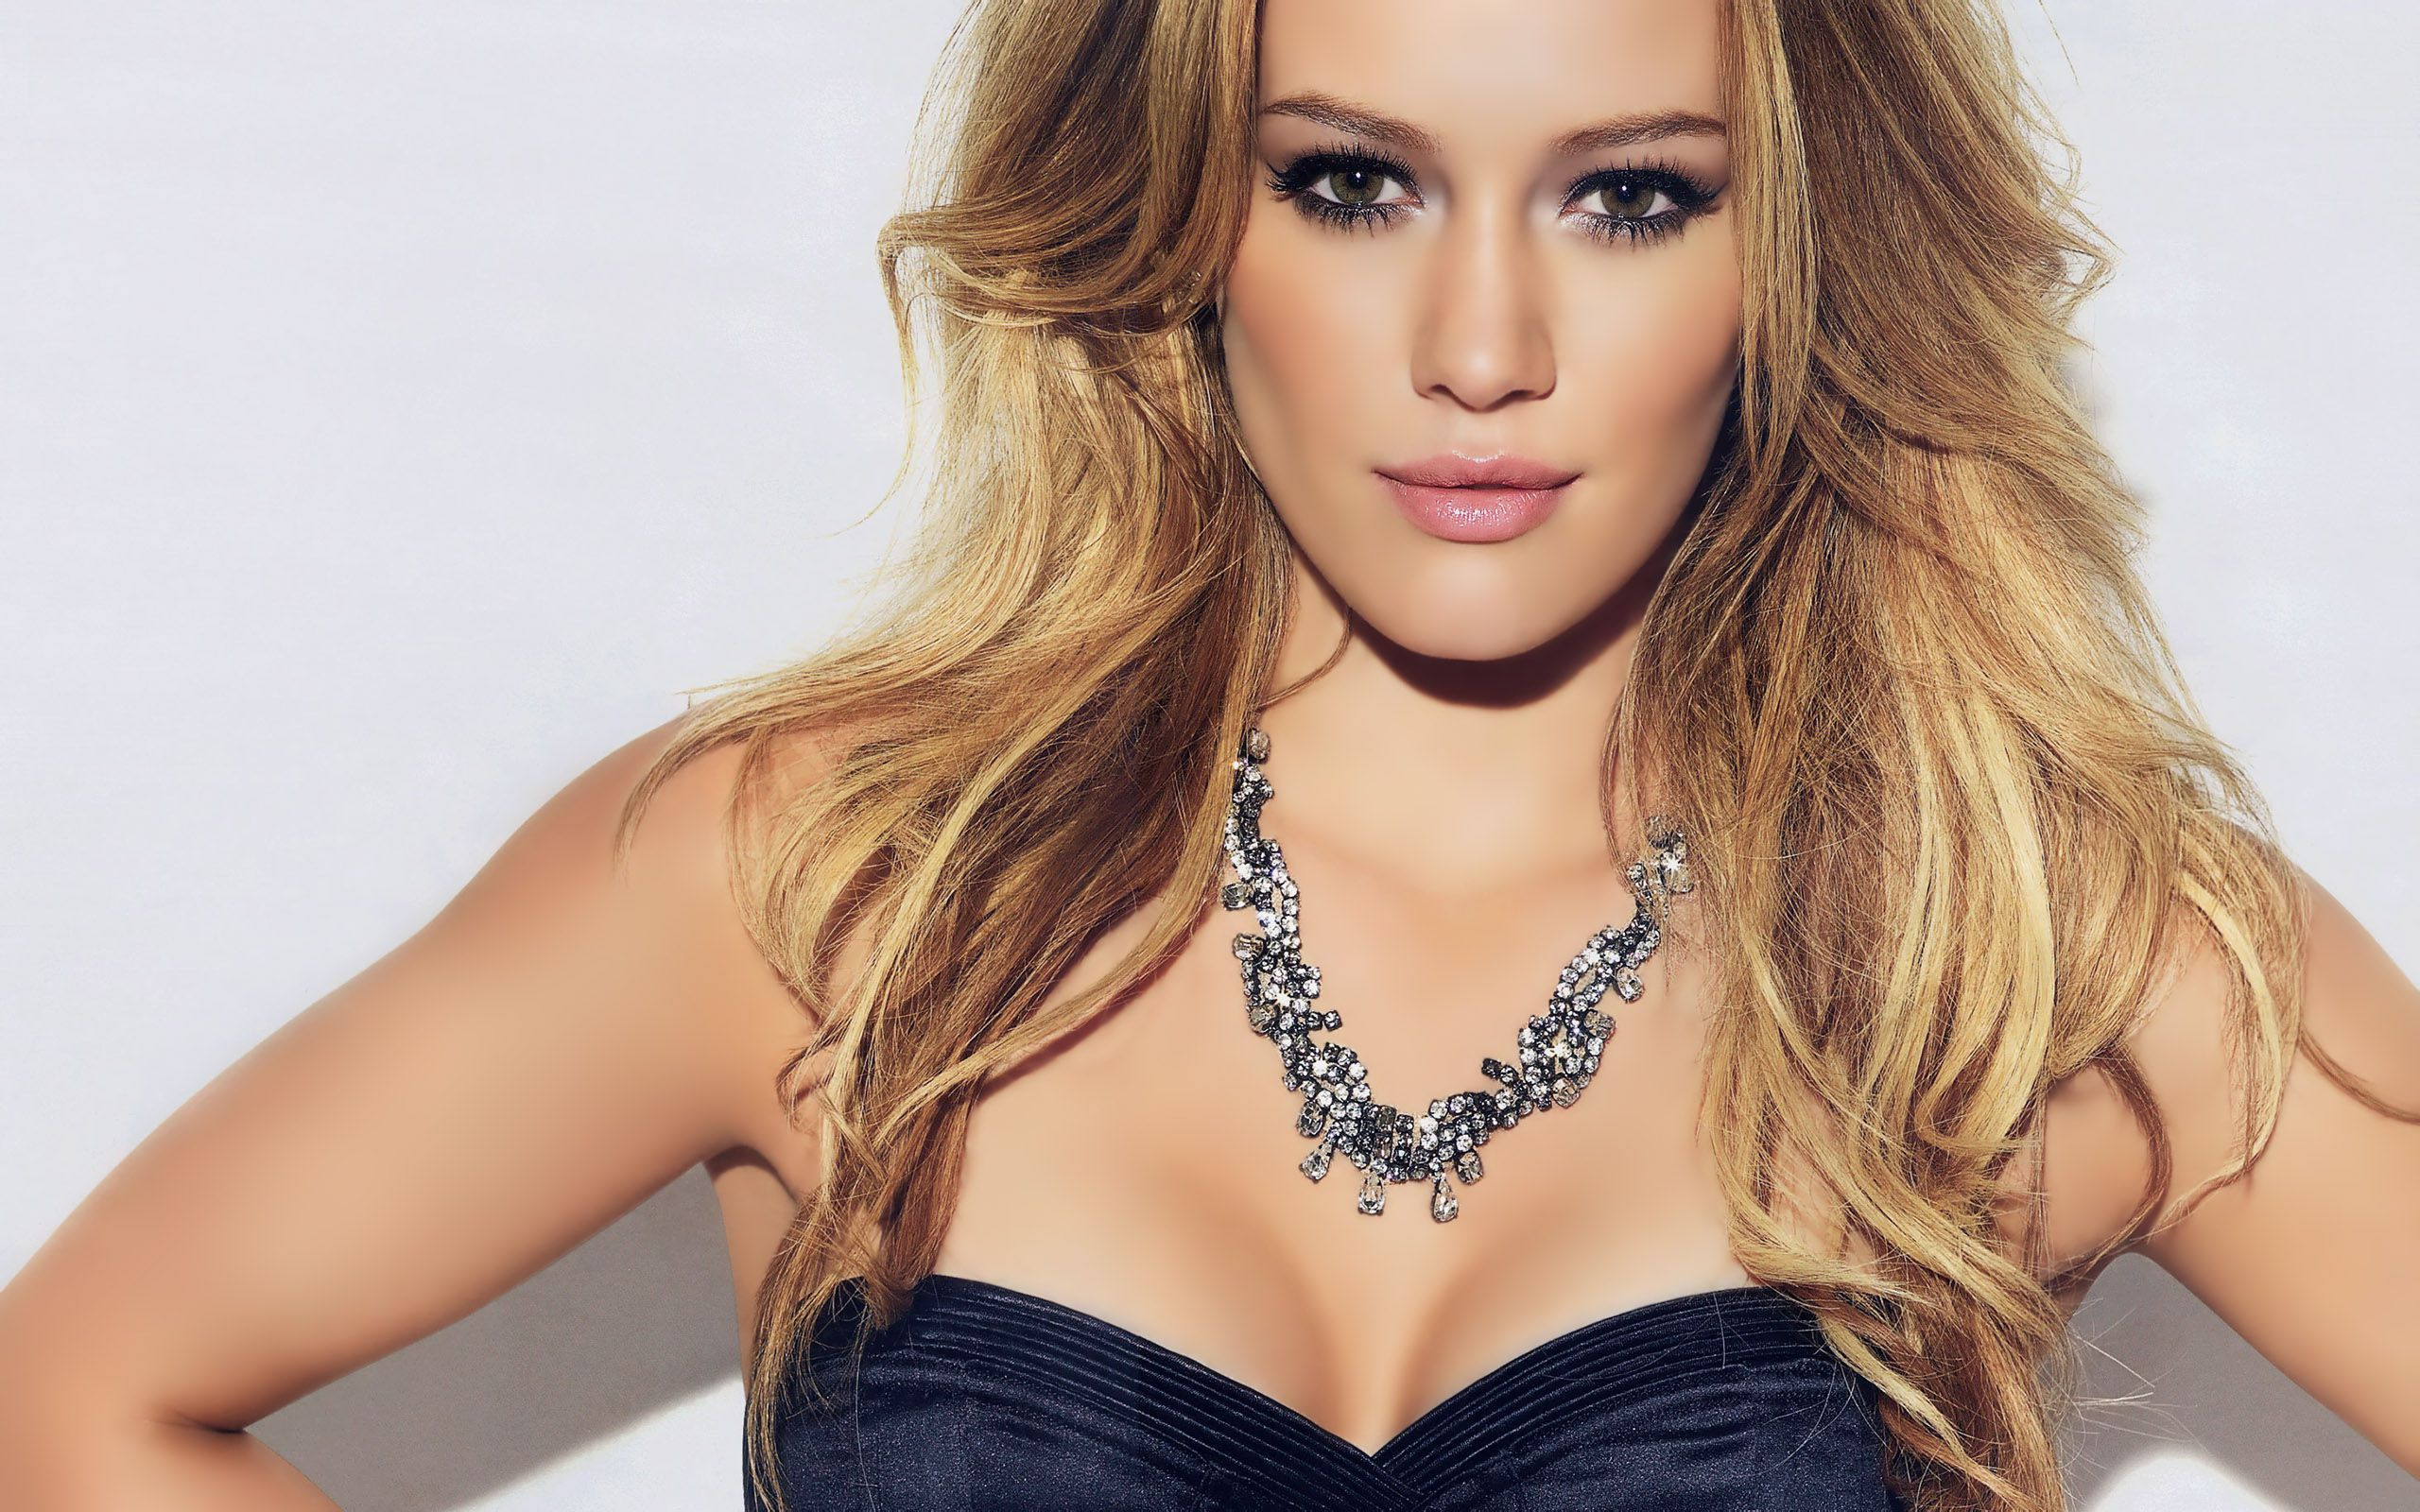 Hilary Duff Hd Wallpaper